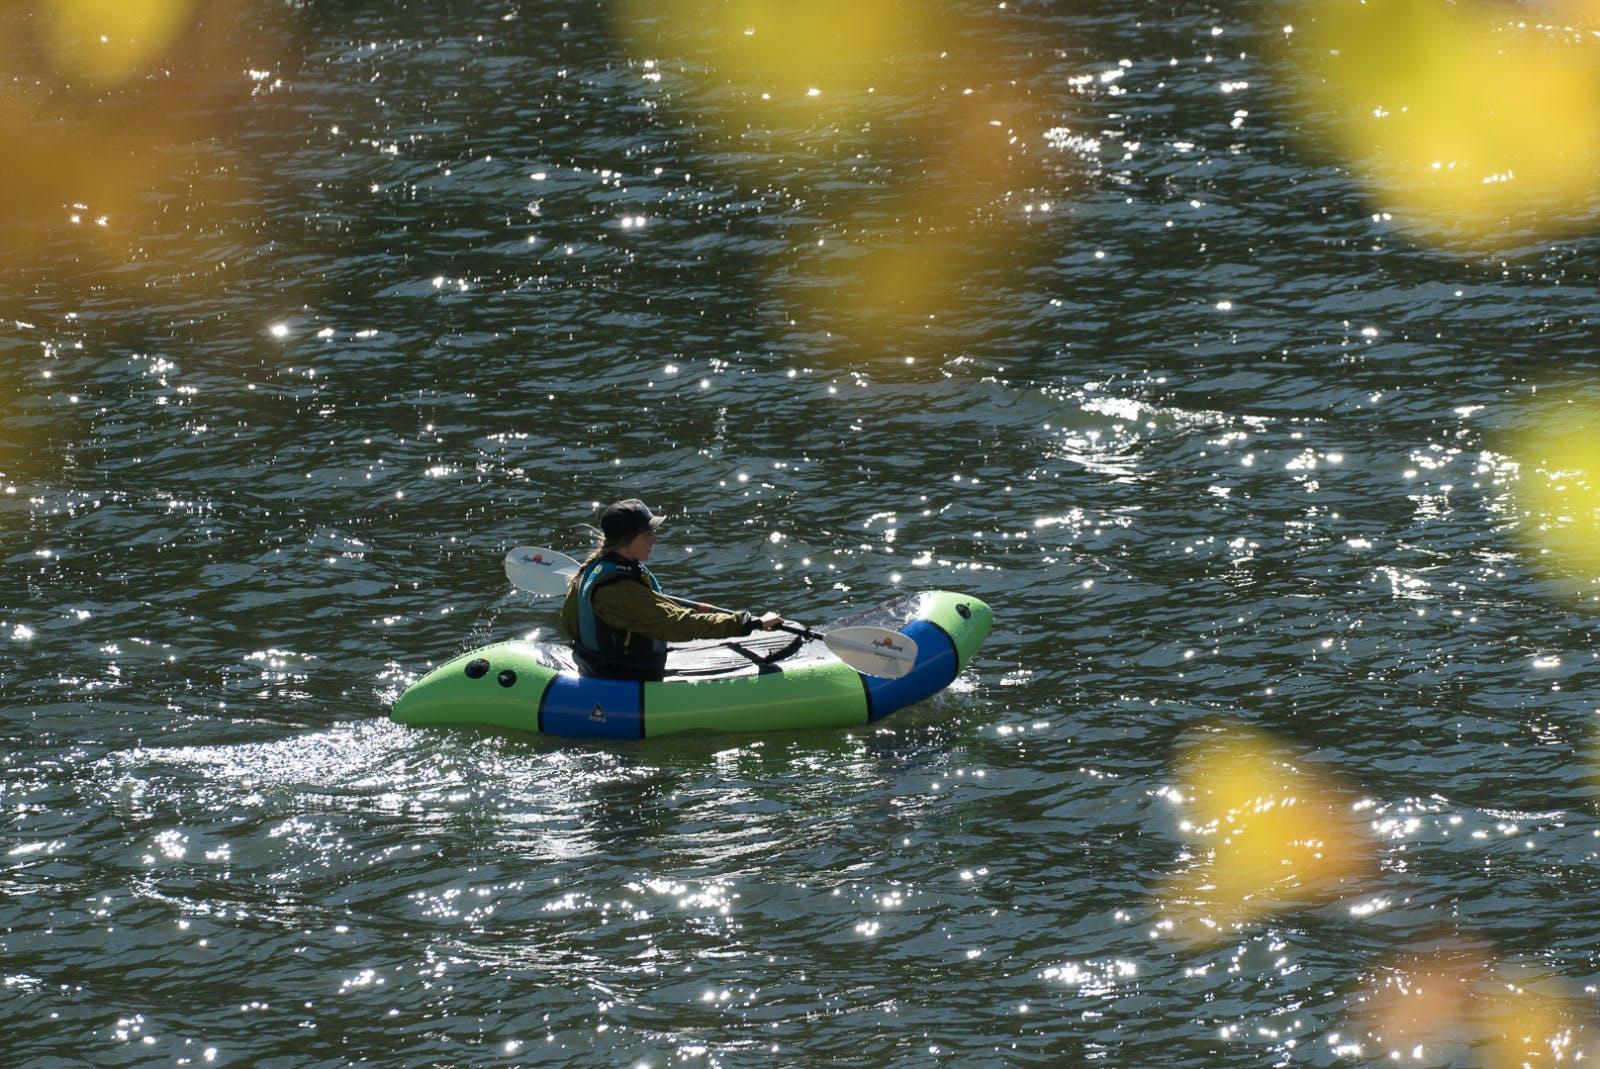 Molly Harrison practicing her paddling skills on McPhee Reservoir. Photo by Steve Fassbinder.